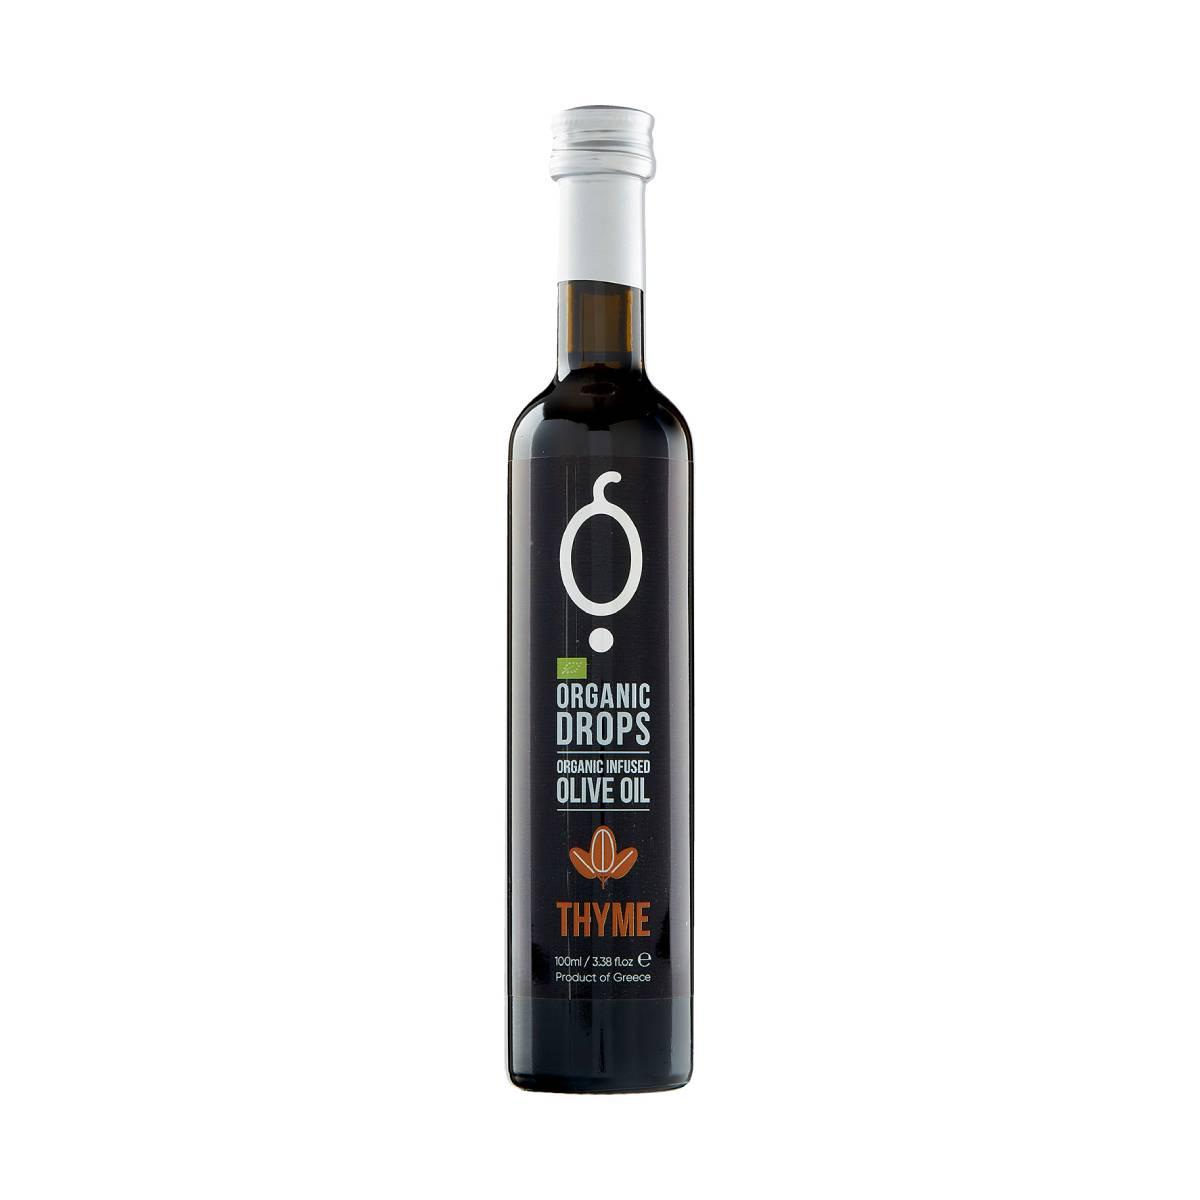 Organic Drops Thyme Organic Olive Oil